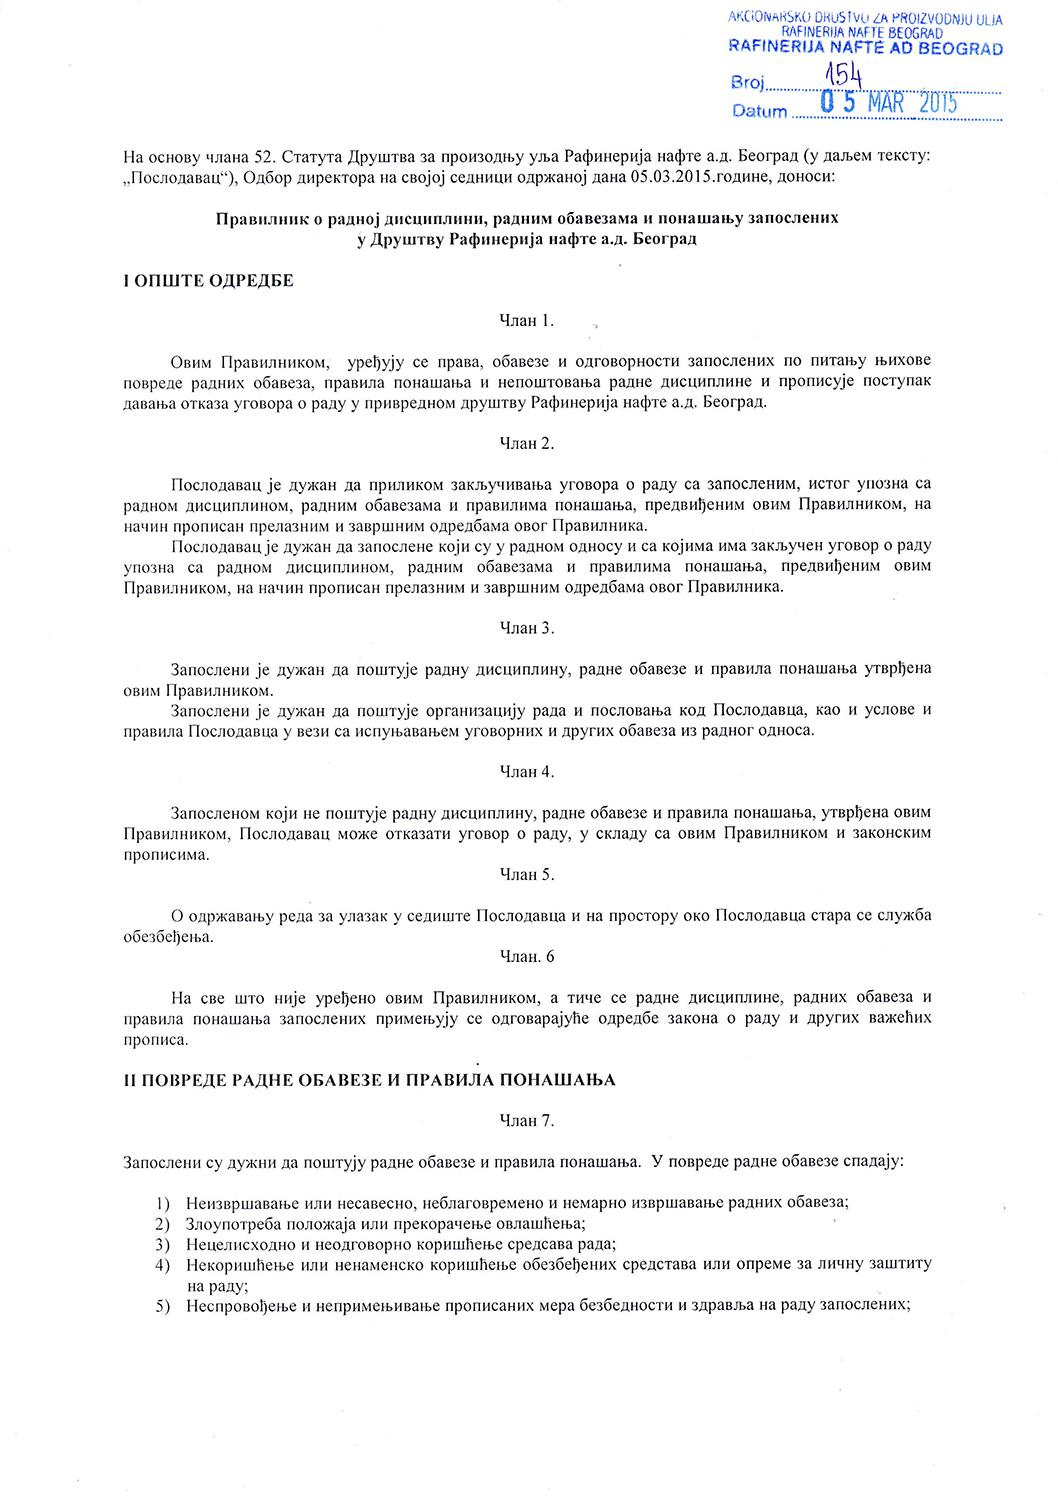 3. Pravilnik o radnoj disciplini, radnim obavezama i ponašanju zaposlenih